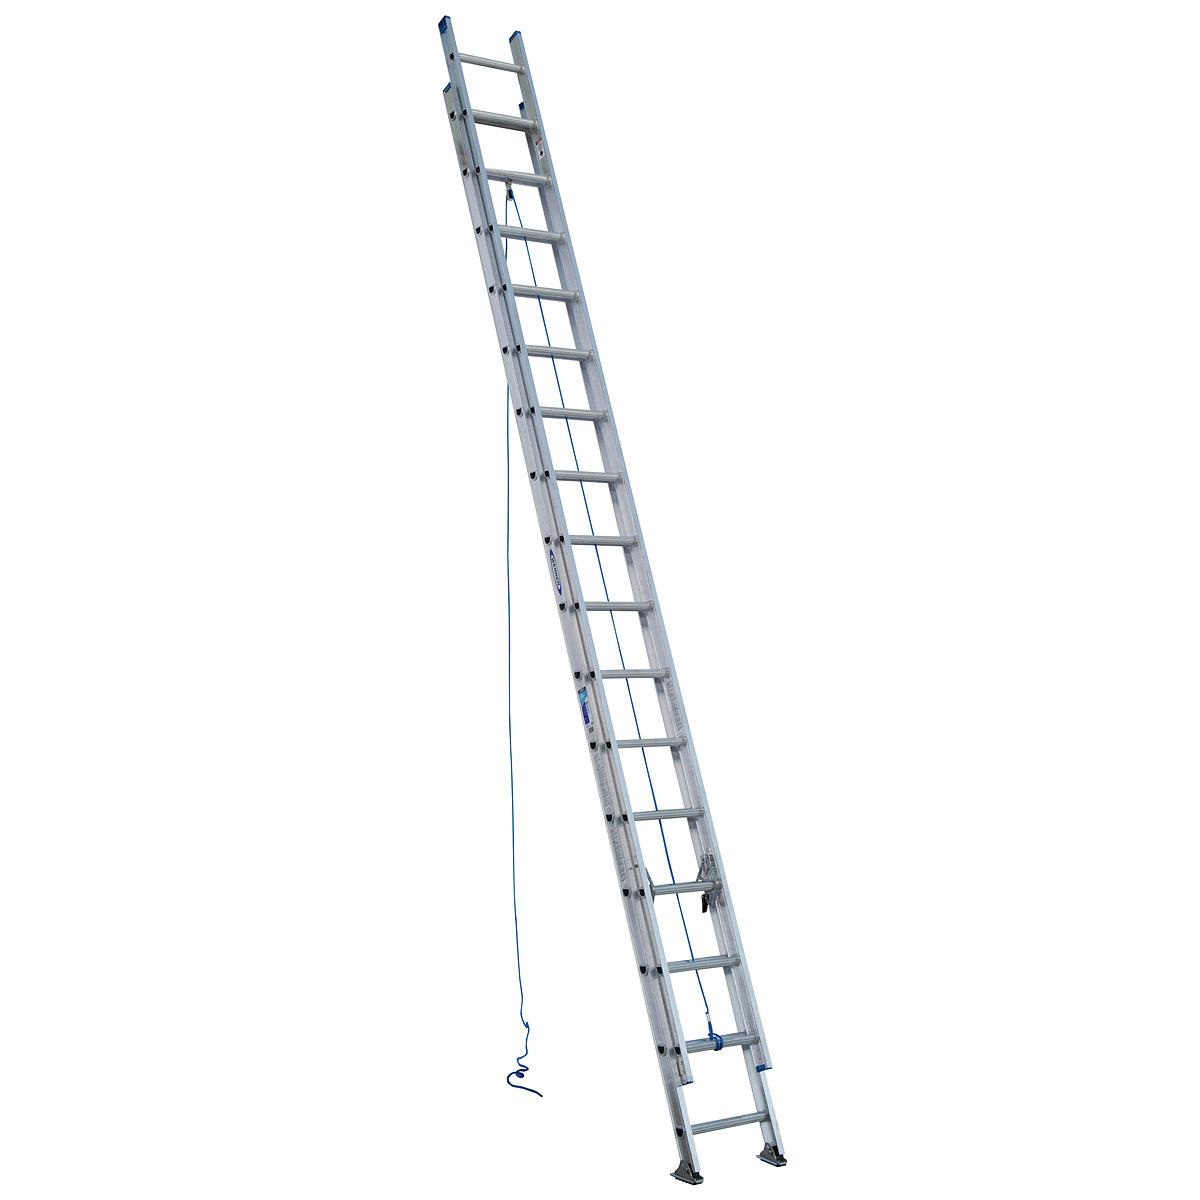 32ft Extension Ladder Rentalzonepa